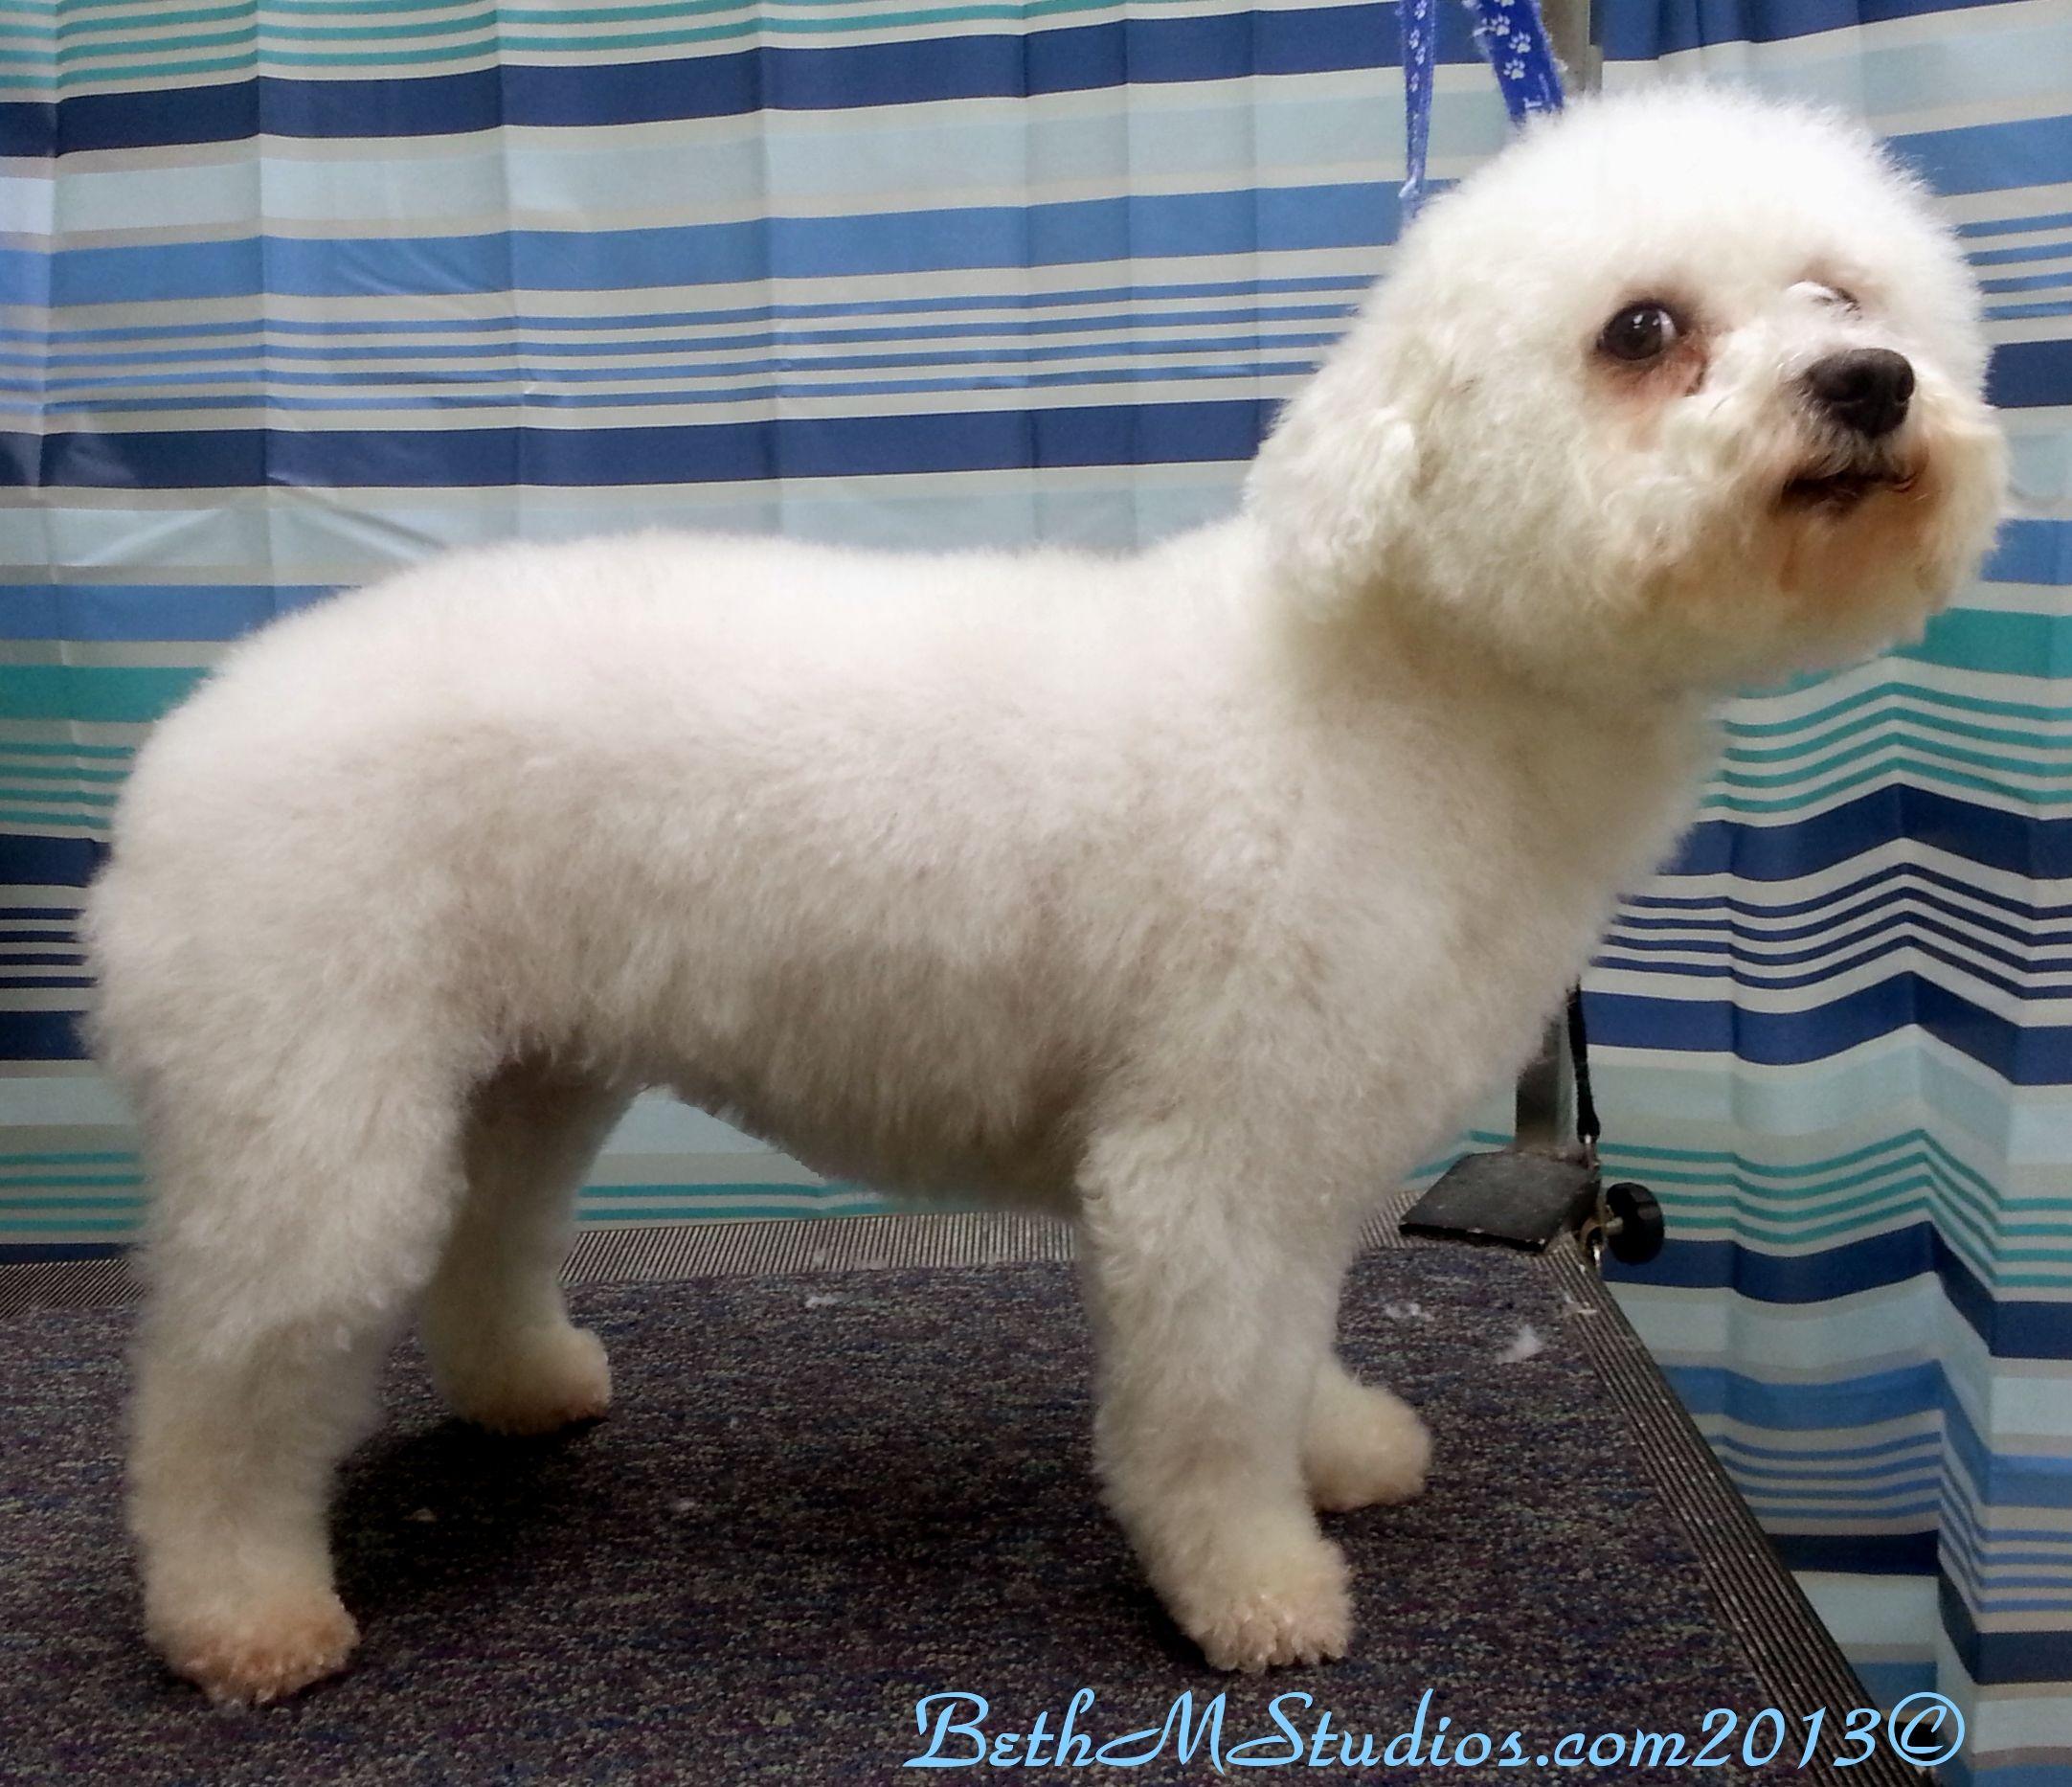 Bella-(Bichon/Poodle) After a Breed Style http://www.gooddogsspaandstudio.com